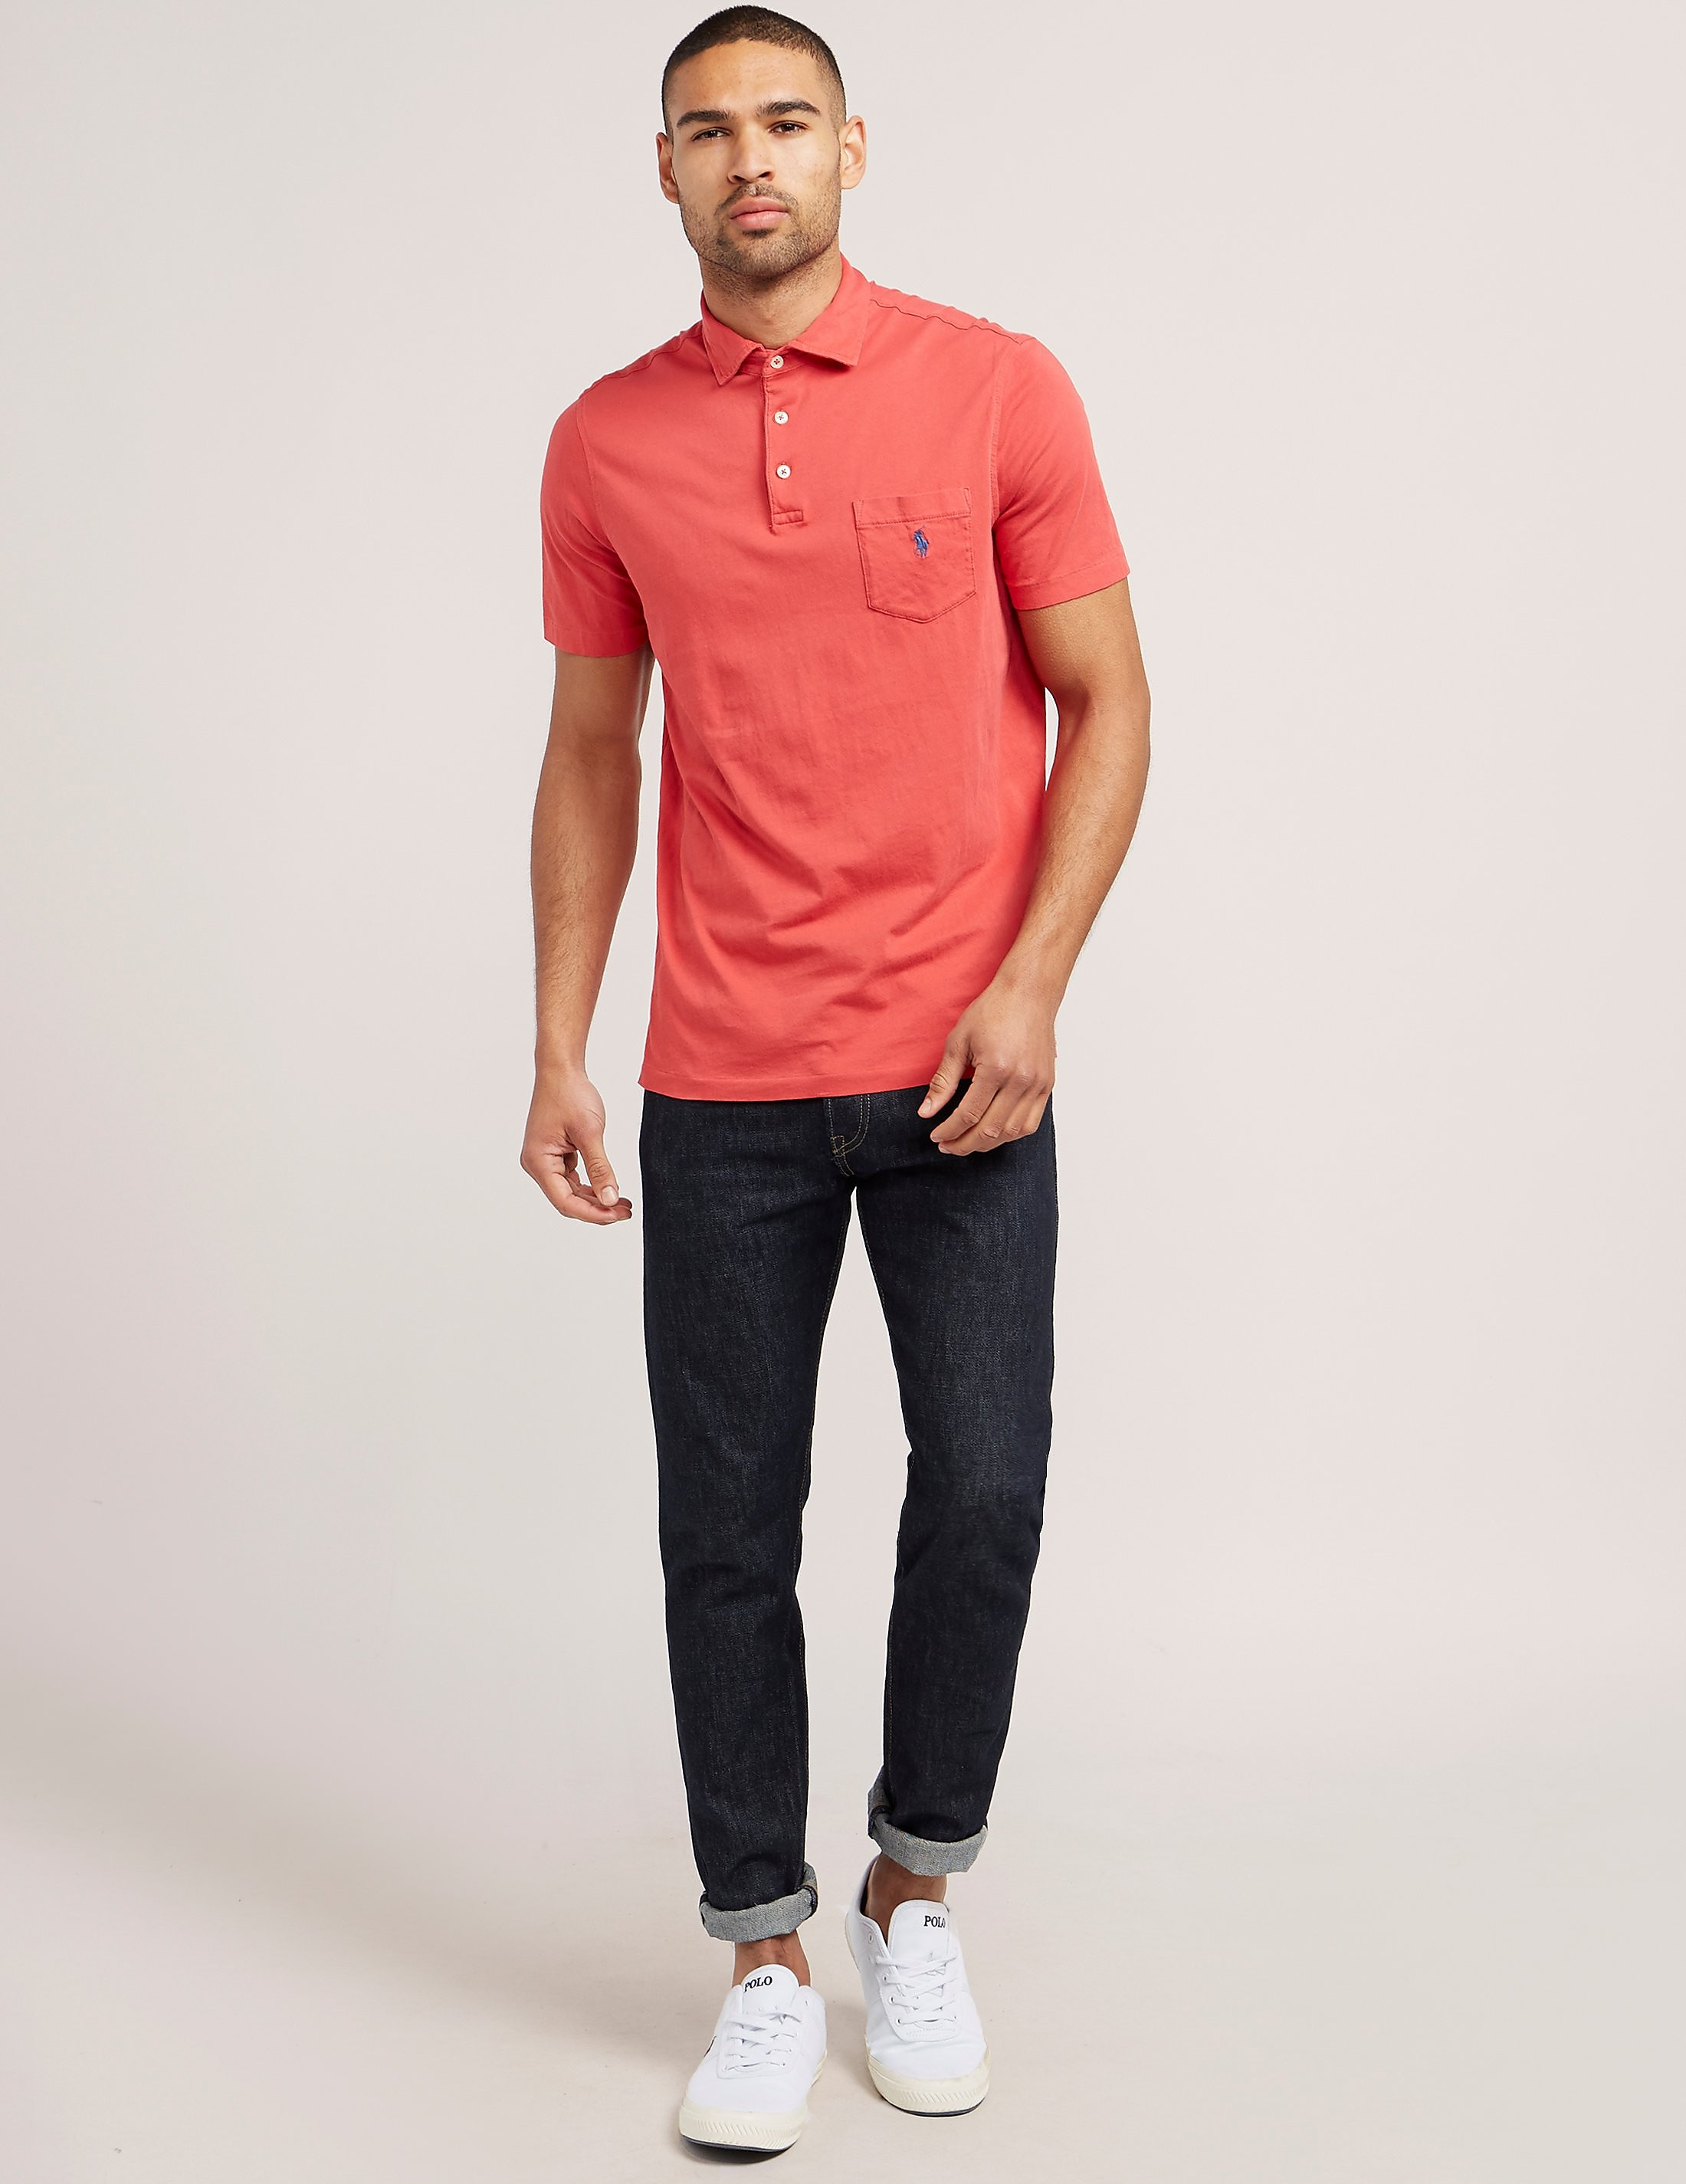 Polo Ralph Lauren Short Sleeve Pocket Polo Shirt